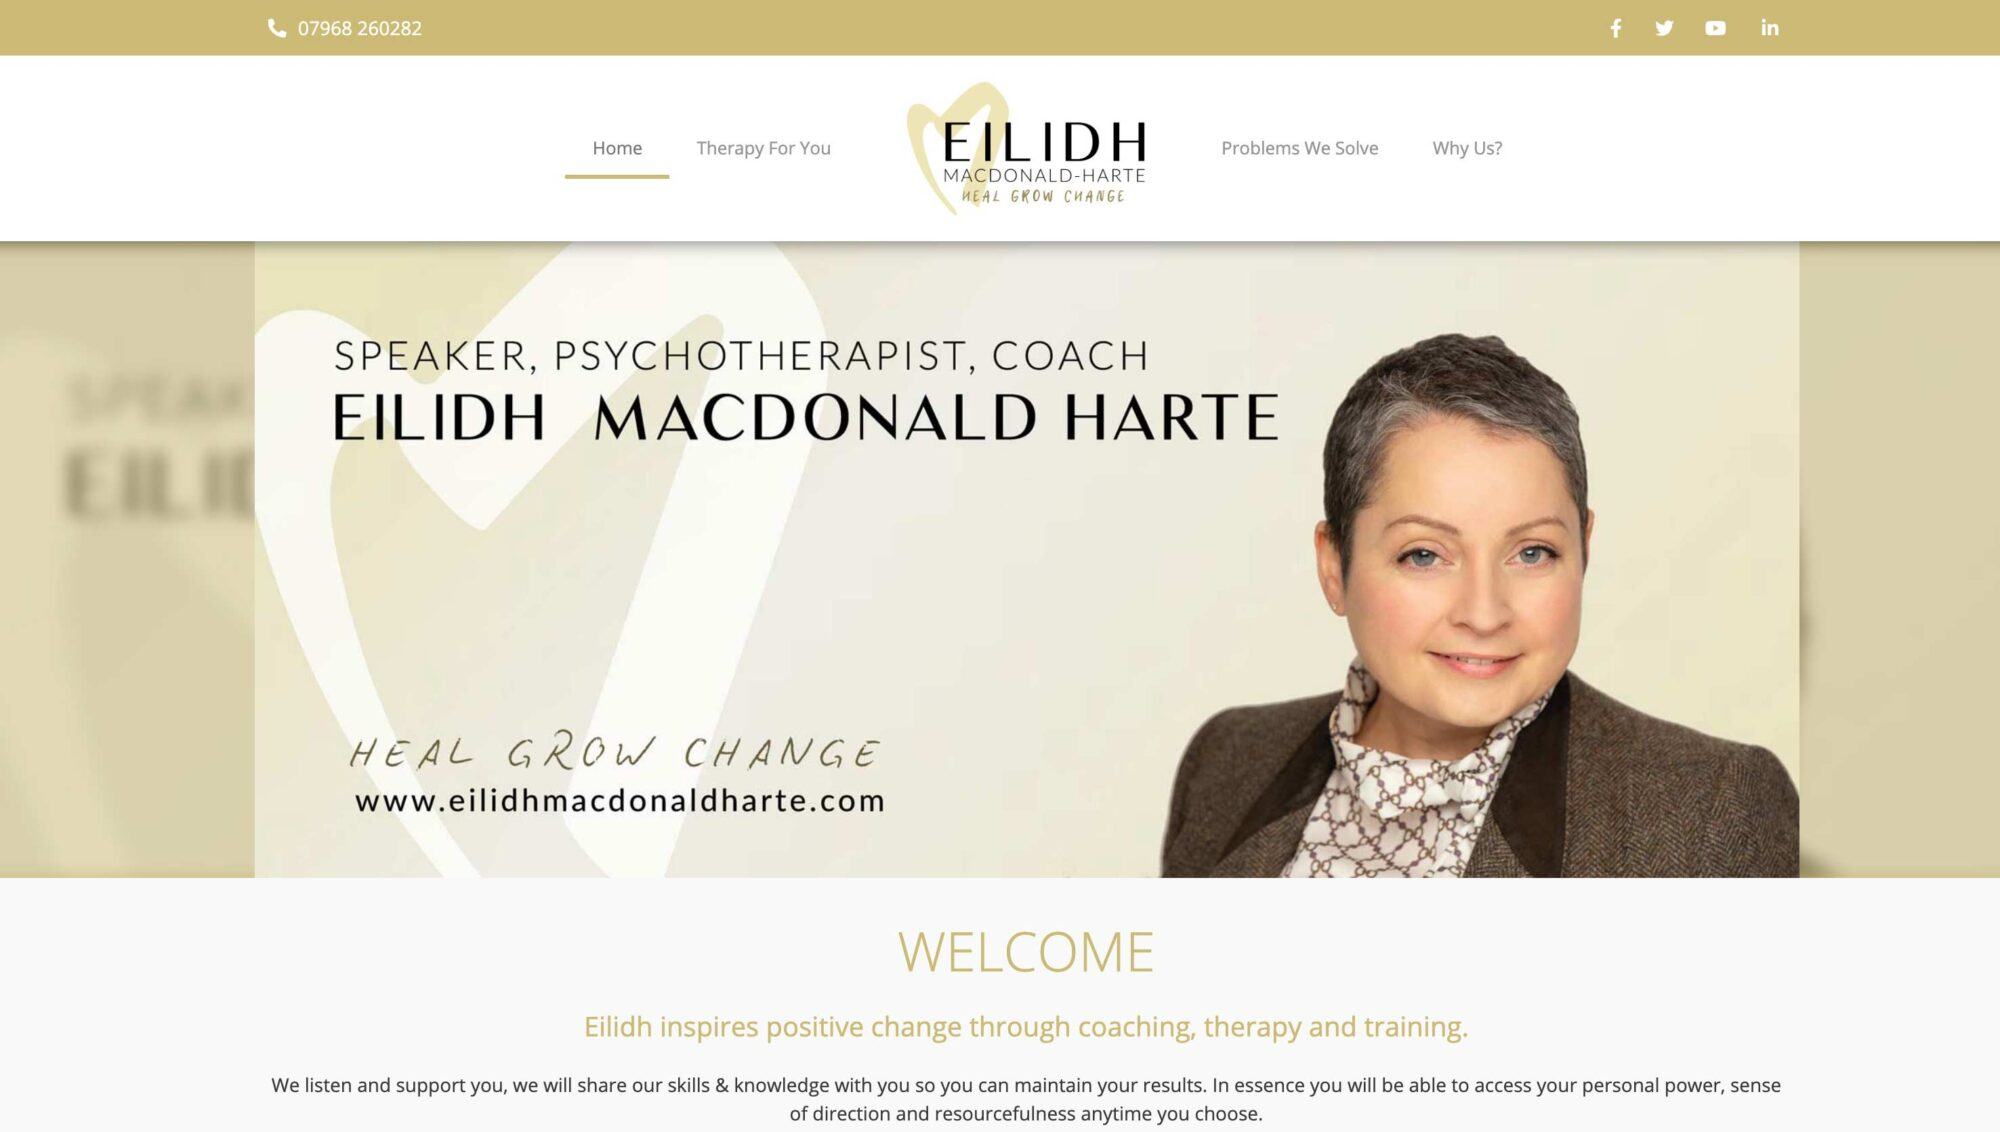 Eilidh Macdonald Harte